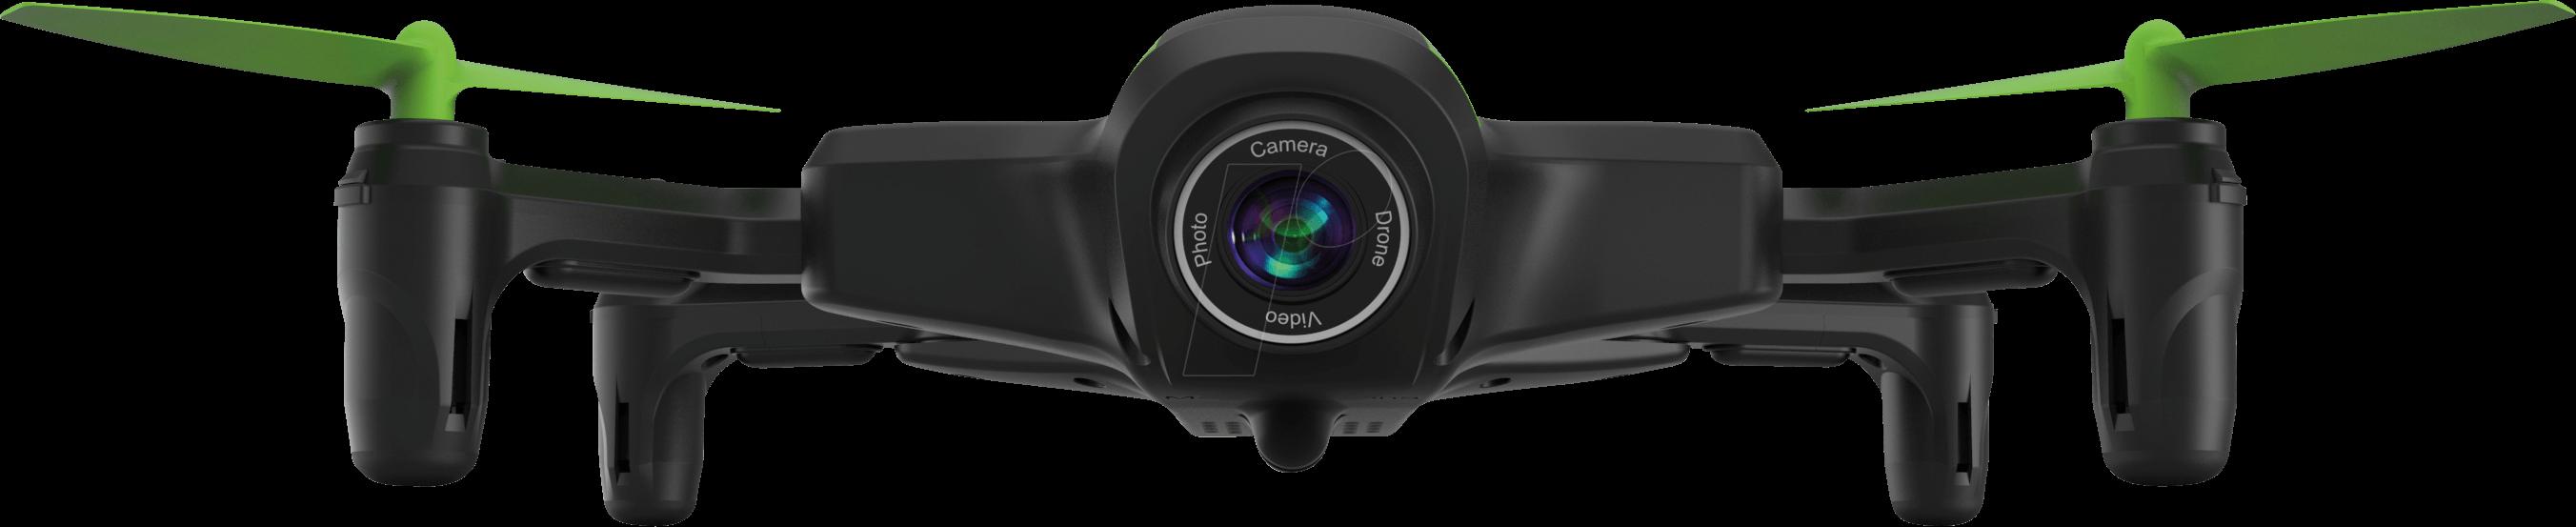 https://cdn-reichelt.de/bilder/web/xxl_ws/E910/ARCHOS_DRONE_VR_02.png